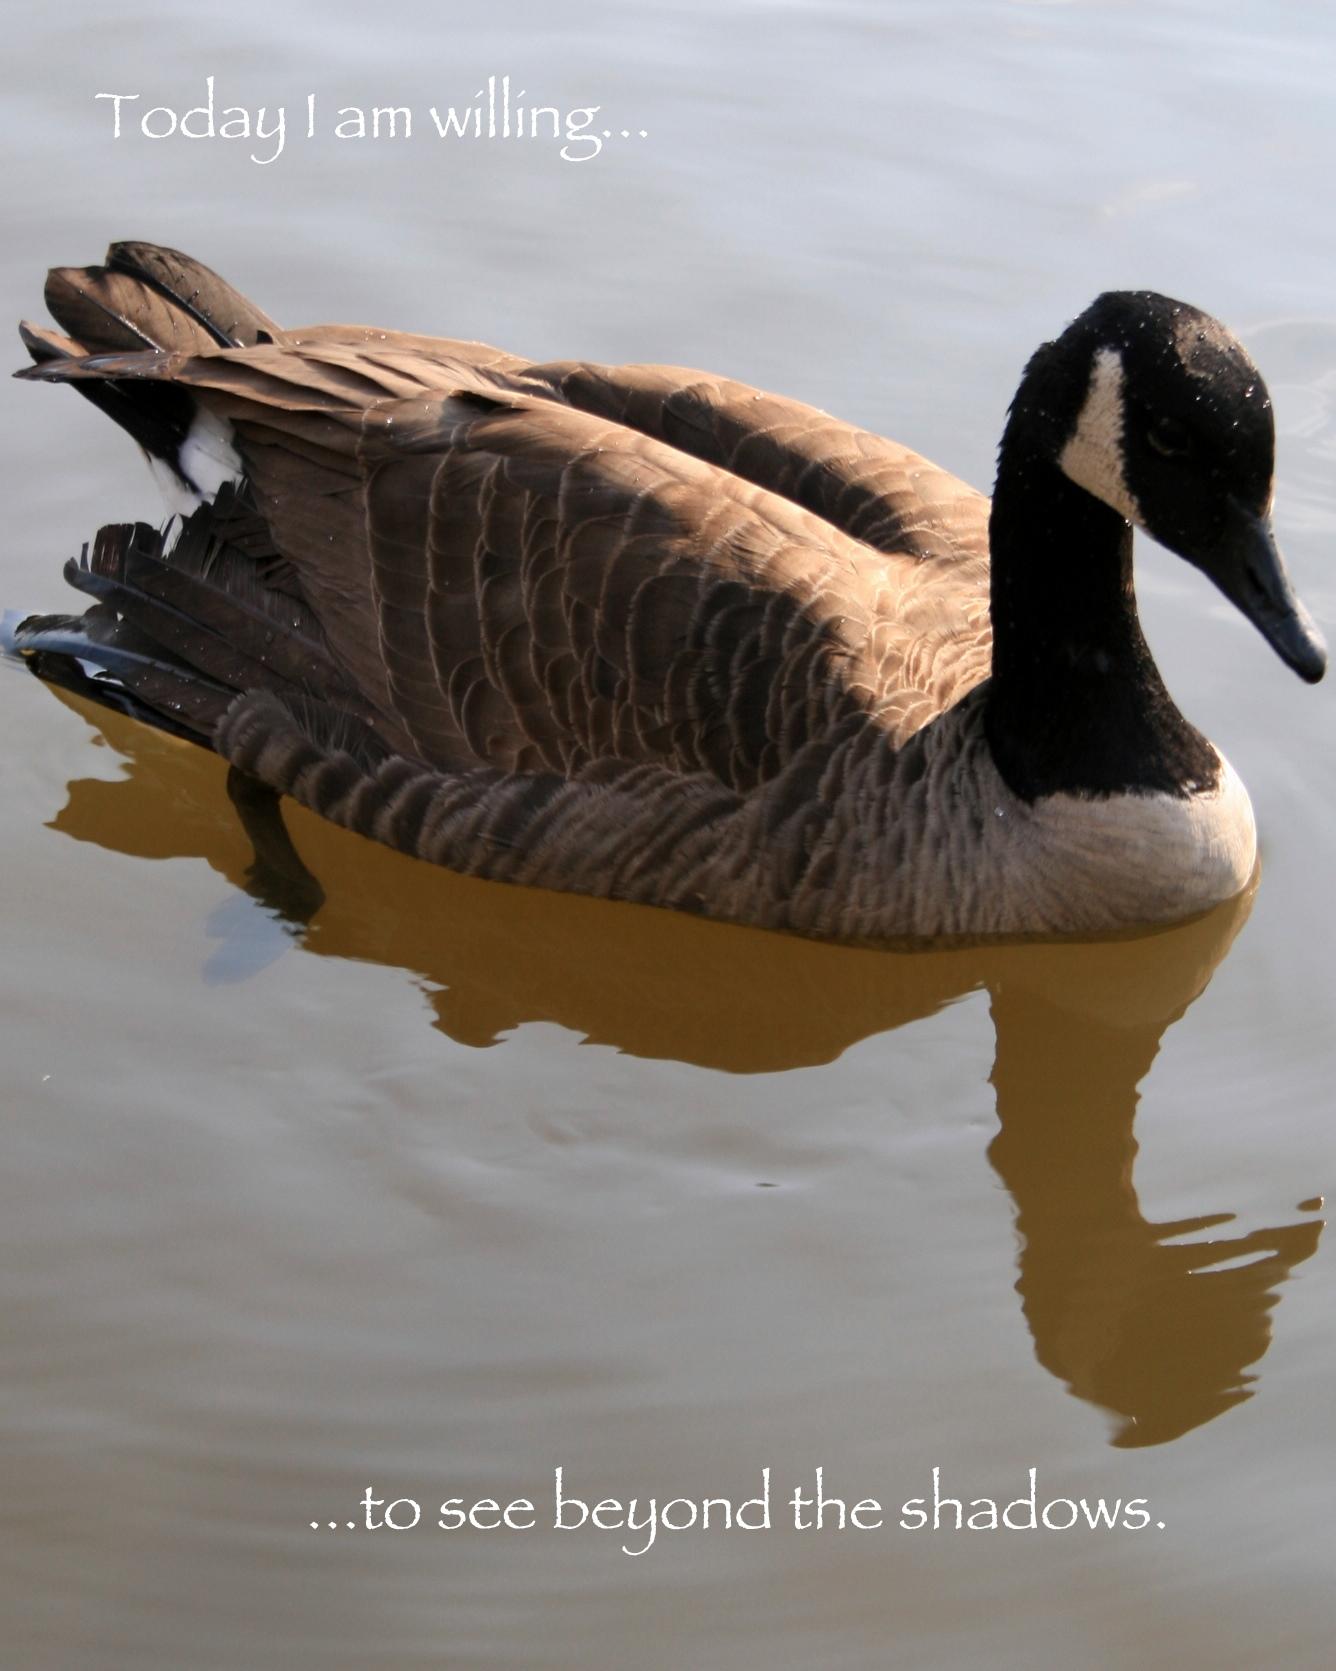 Goose_see beyond the shadows.JPG